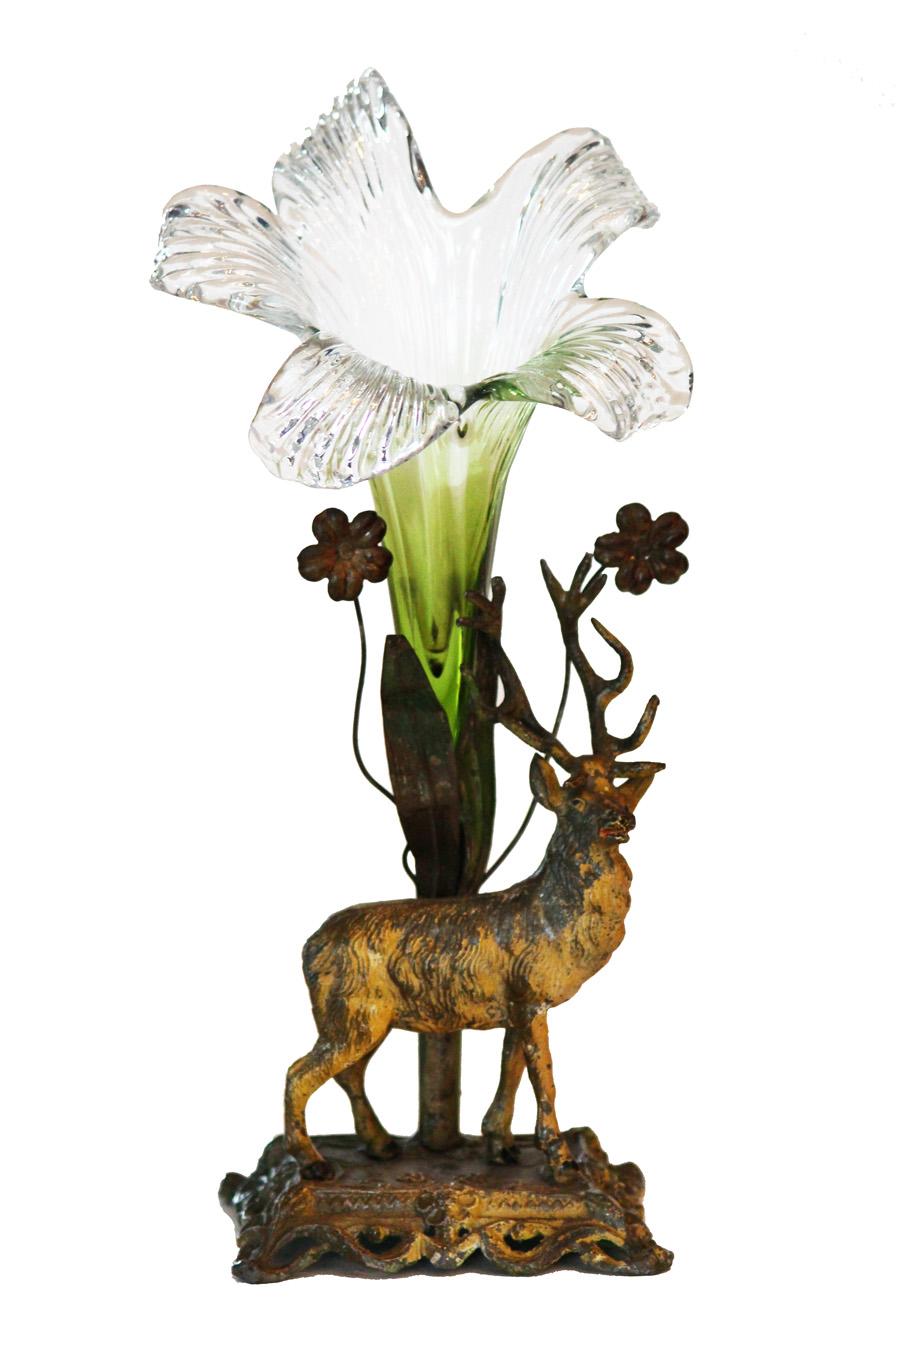 Victorian Rare Figural Deer Art Glass Epergne Beautiful-Victorian Rare Figural Deer Art Glass Epergne Beautiful